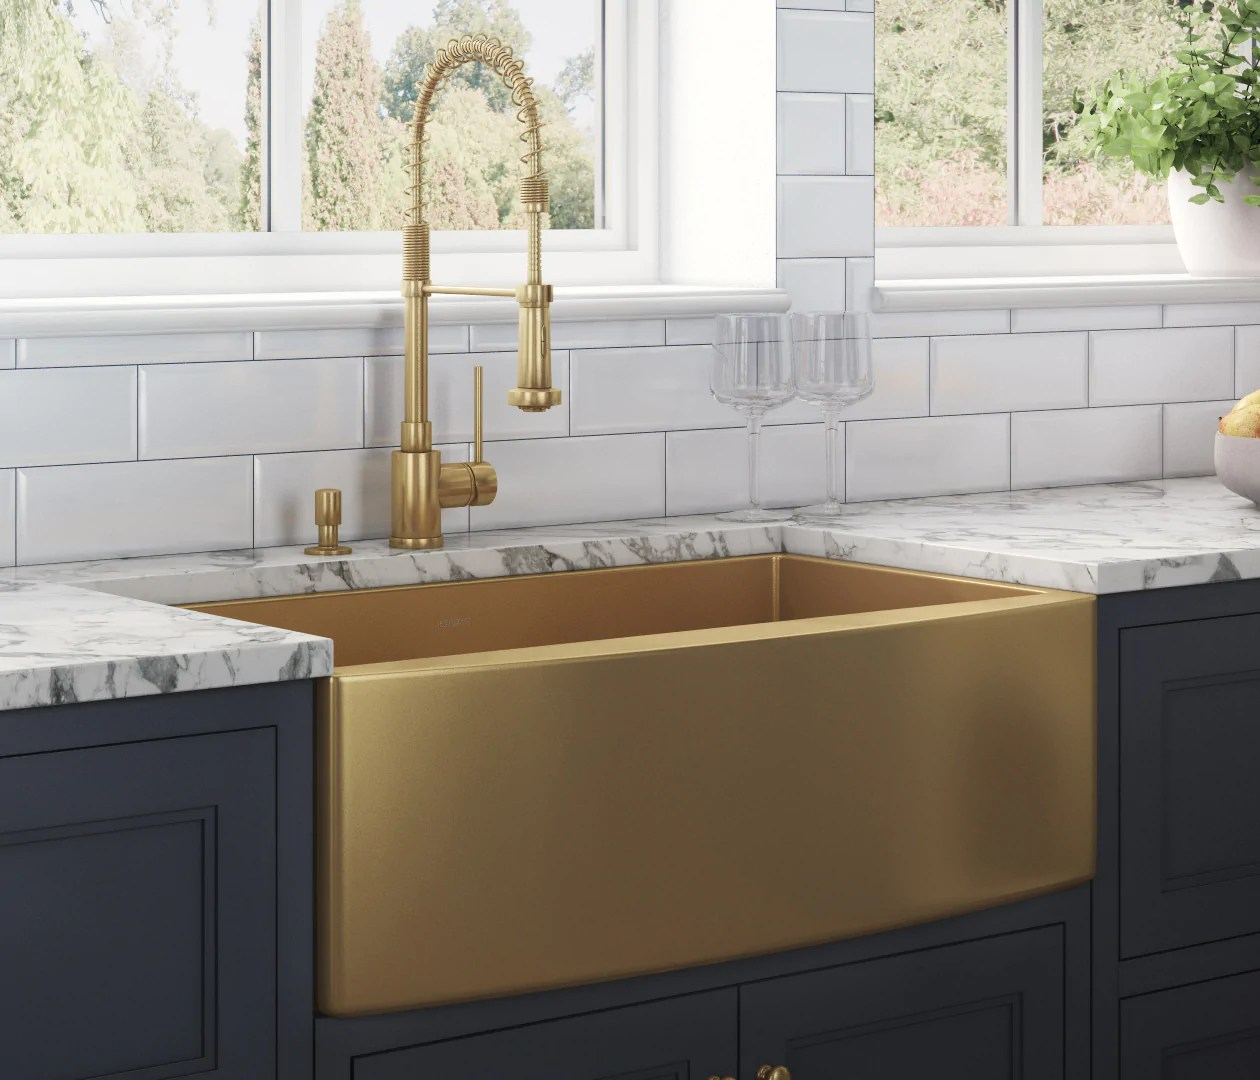 ruvati brass tone 36 inch apron front matte gold stainless steel farmhouse kitchen sink single bowl rvh9880gg